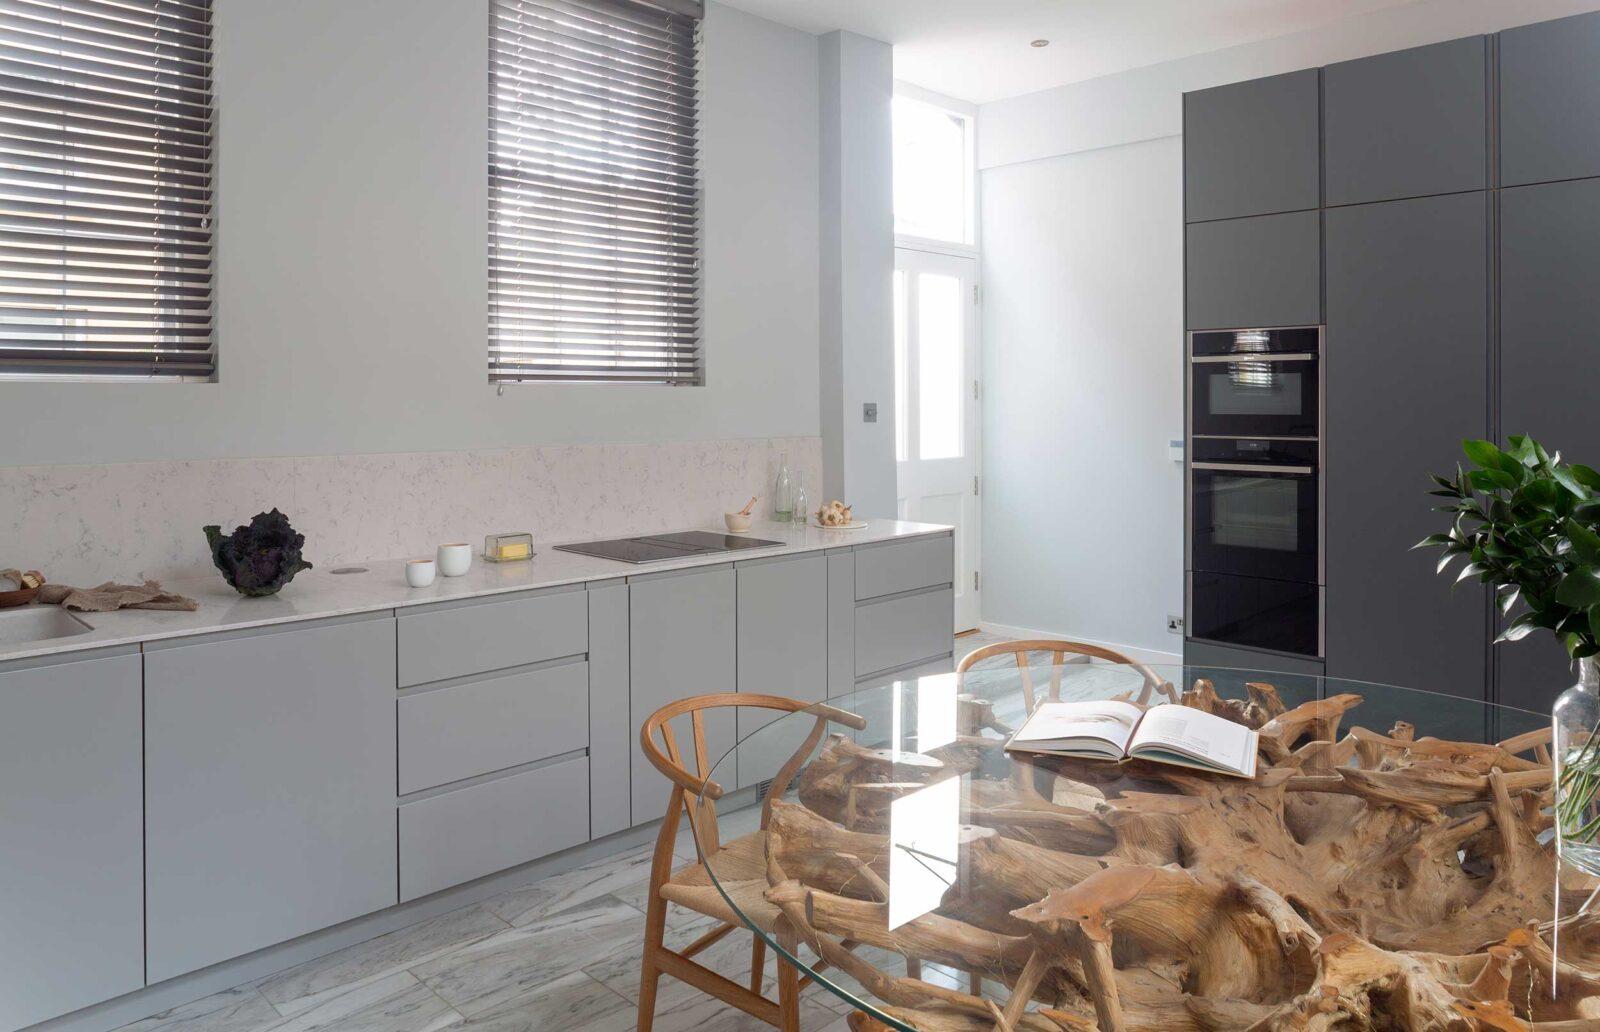 Understated Minimal kitchen cupboard back door